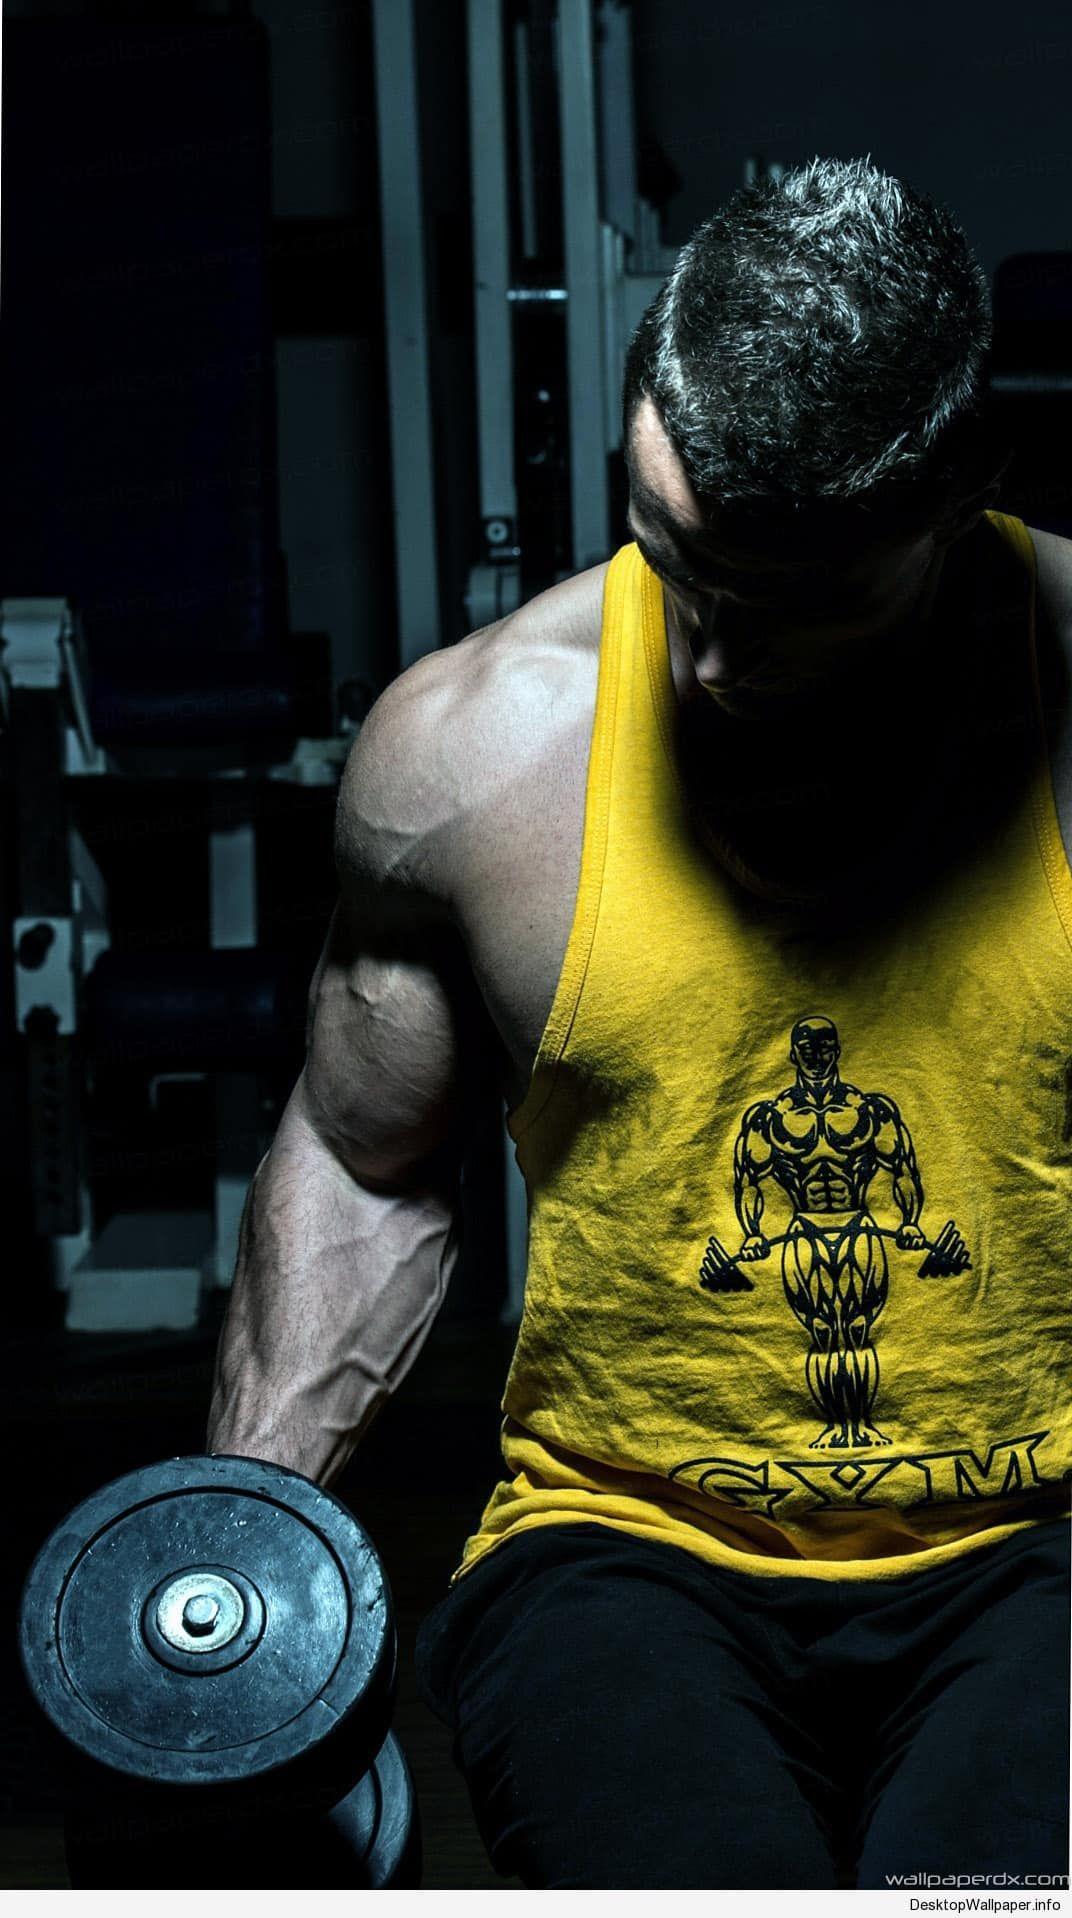 Bodybuilding Hd Wallpaper For Iphone Bodybuilding